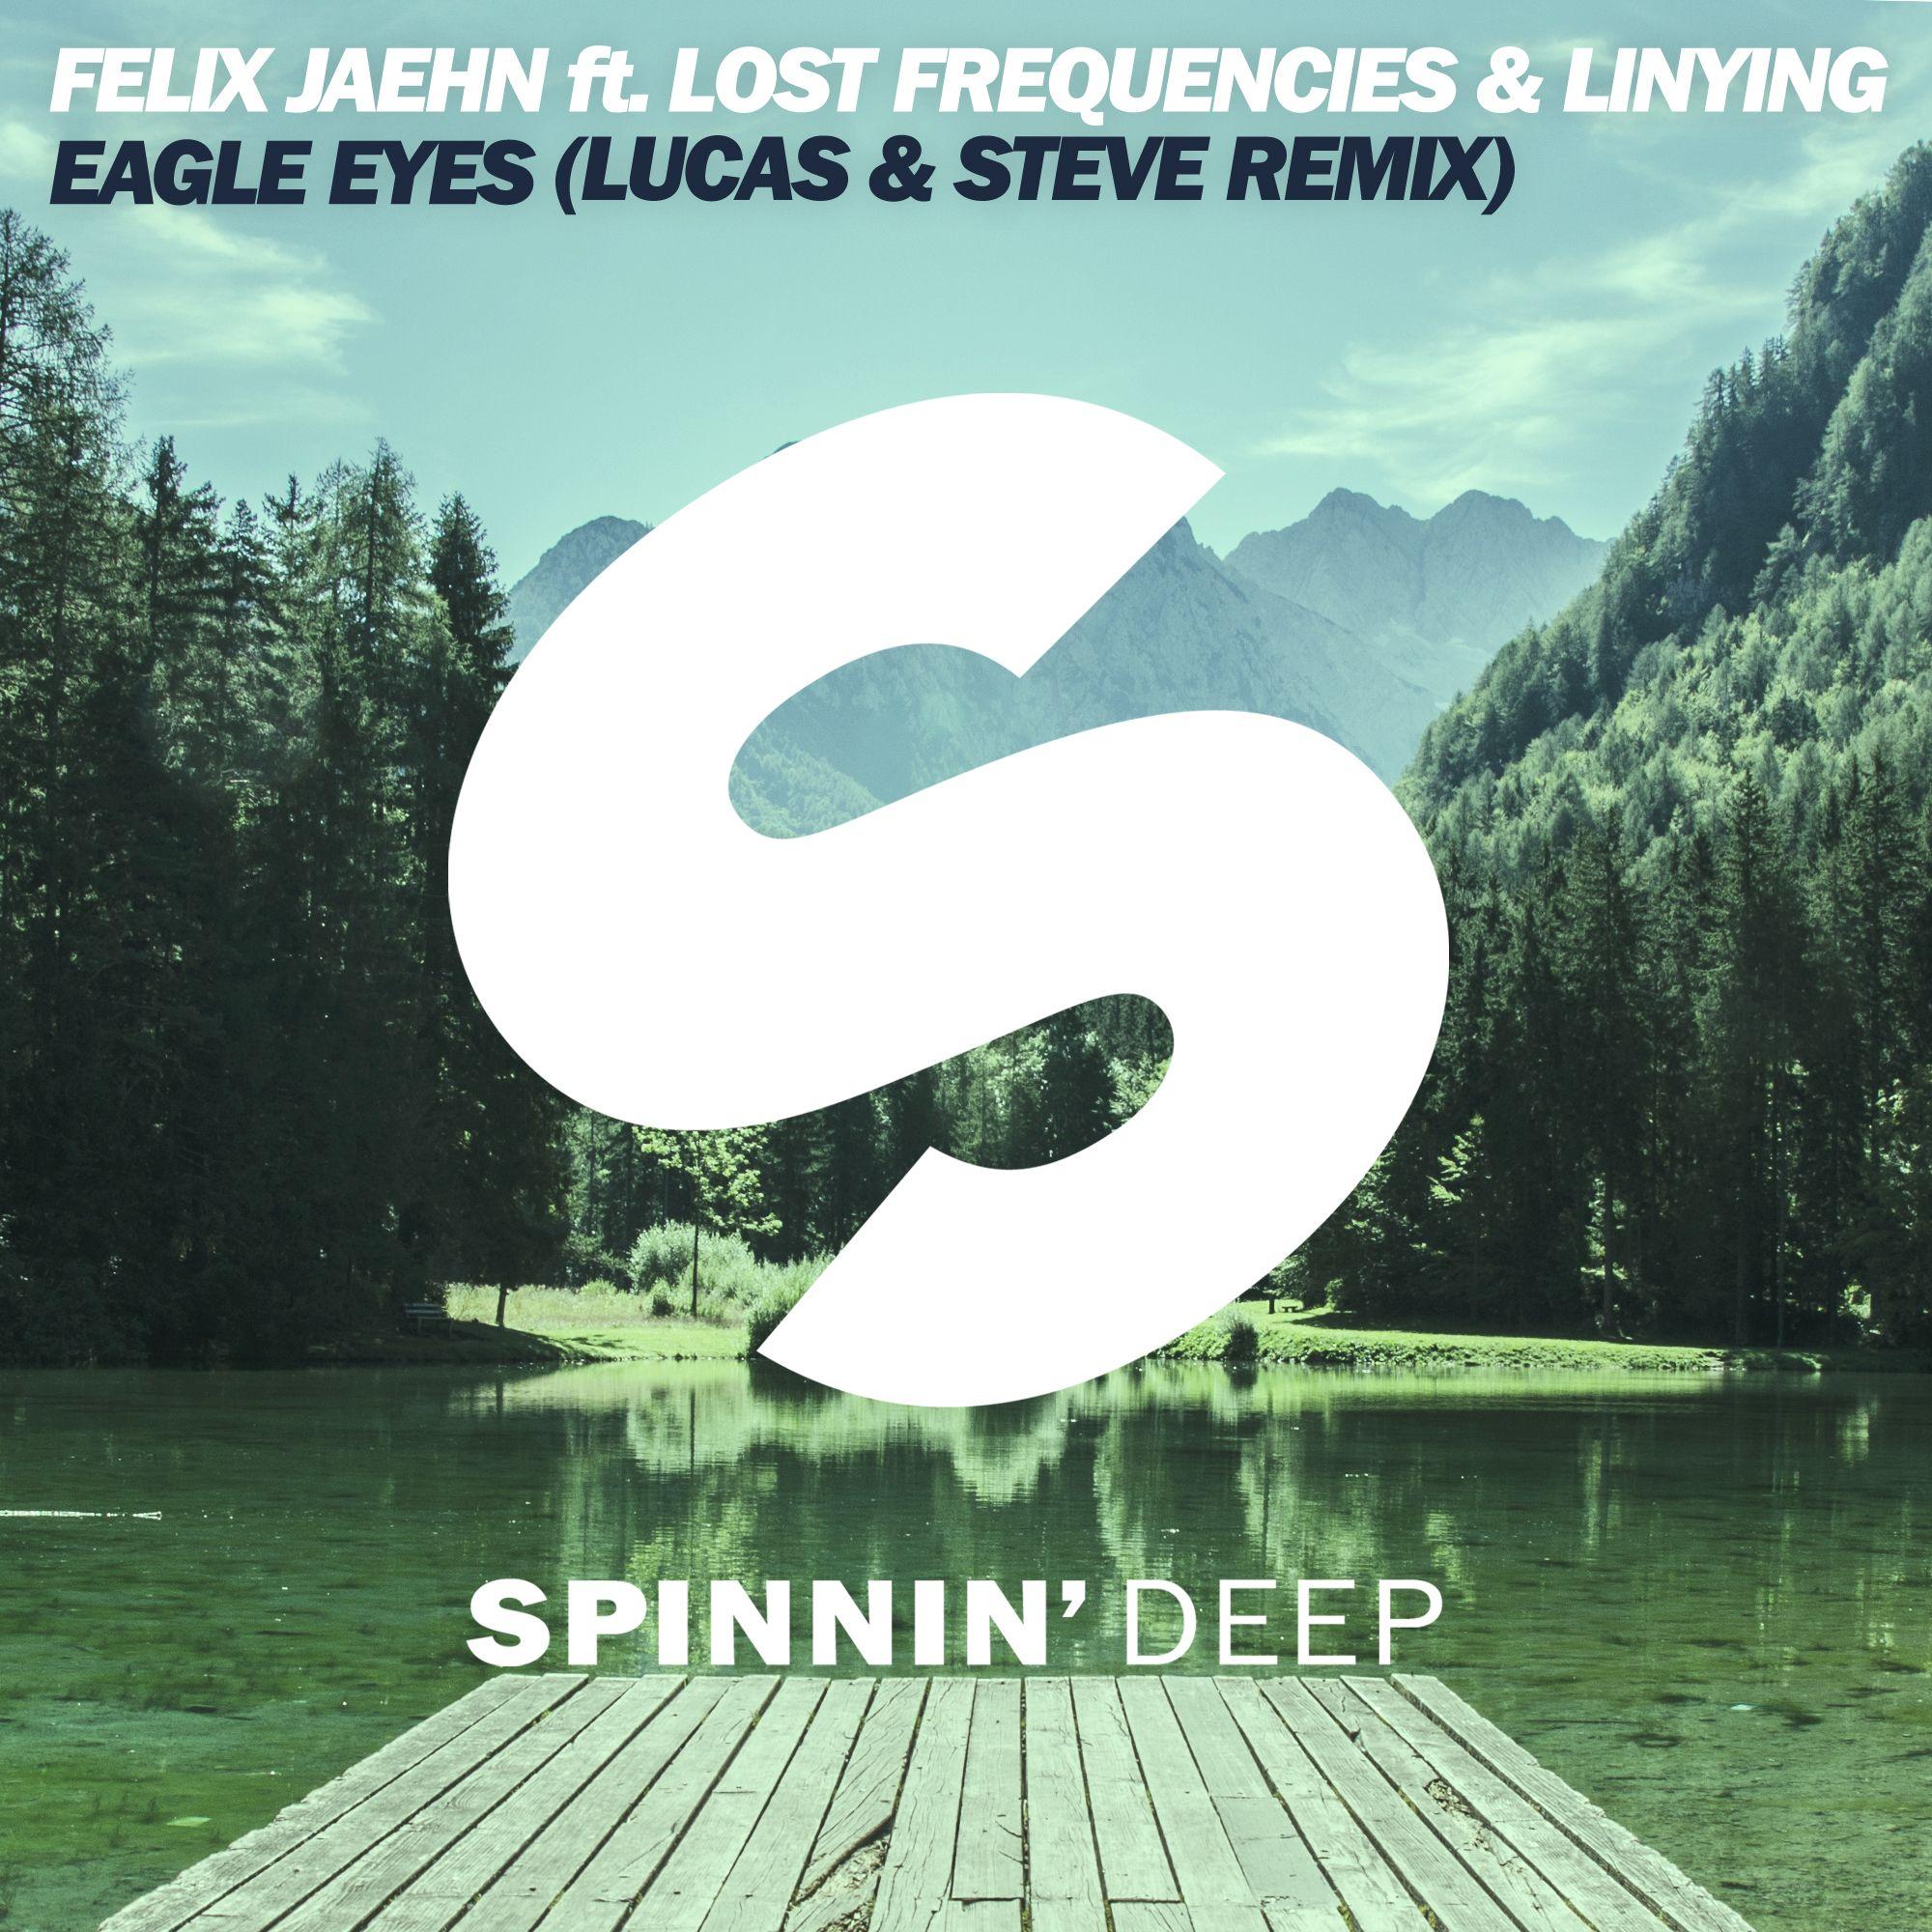 spdeep_felix_jaehn_feat_lost_frequencies_linying_-_eagle_eyes_lucas_steve_remix.jpg